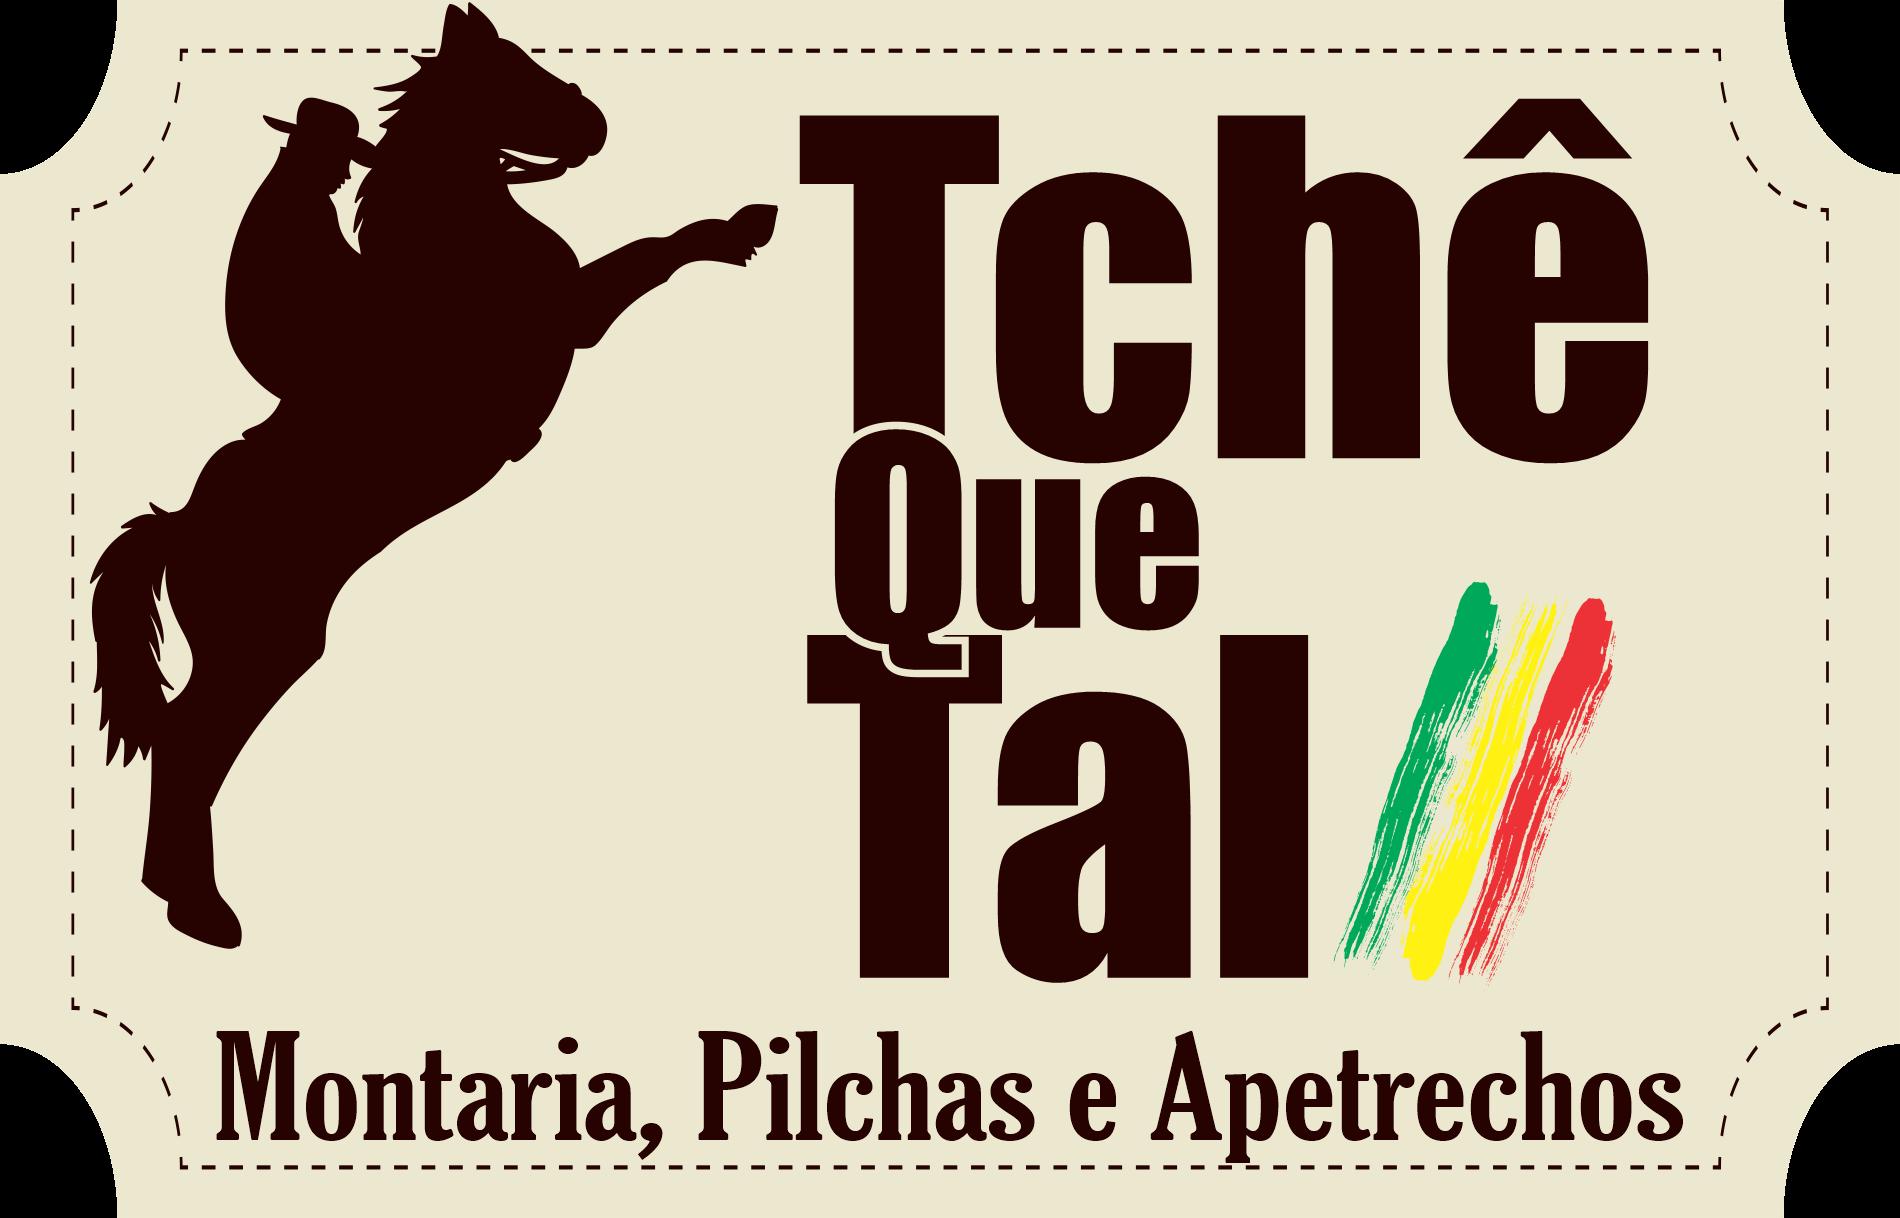 TCHEQUETAL-MONTARIA